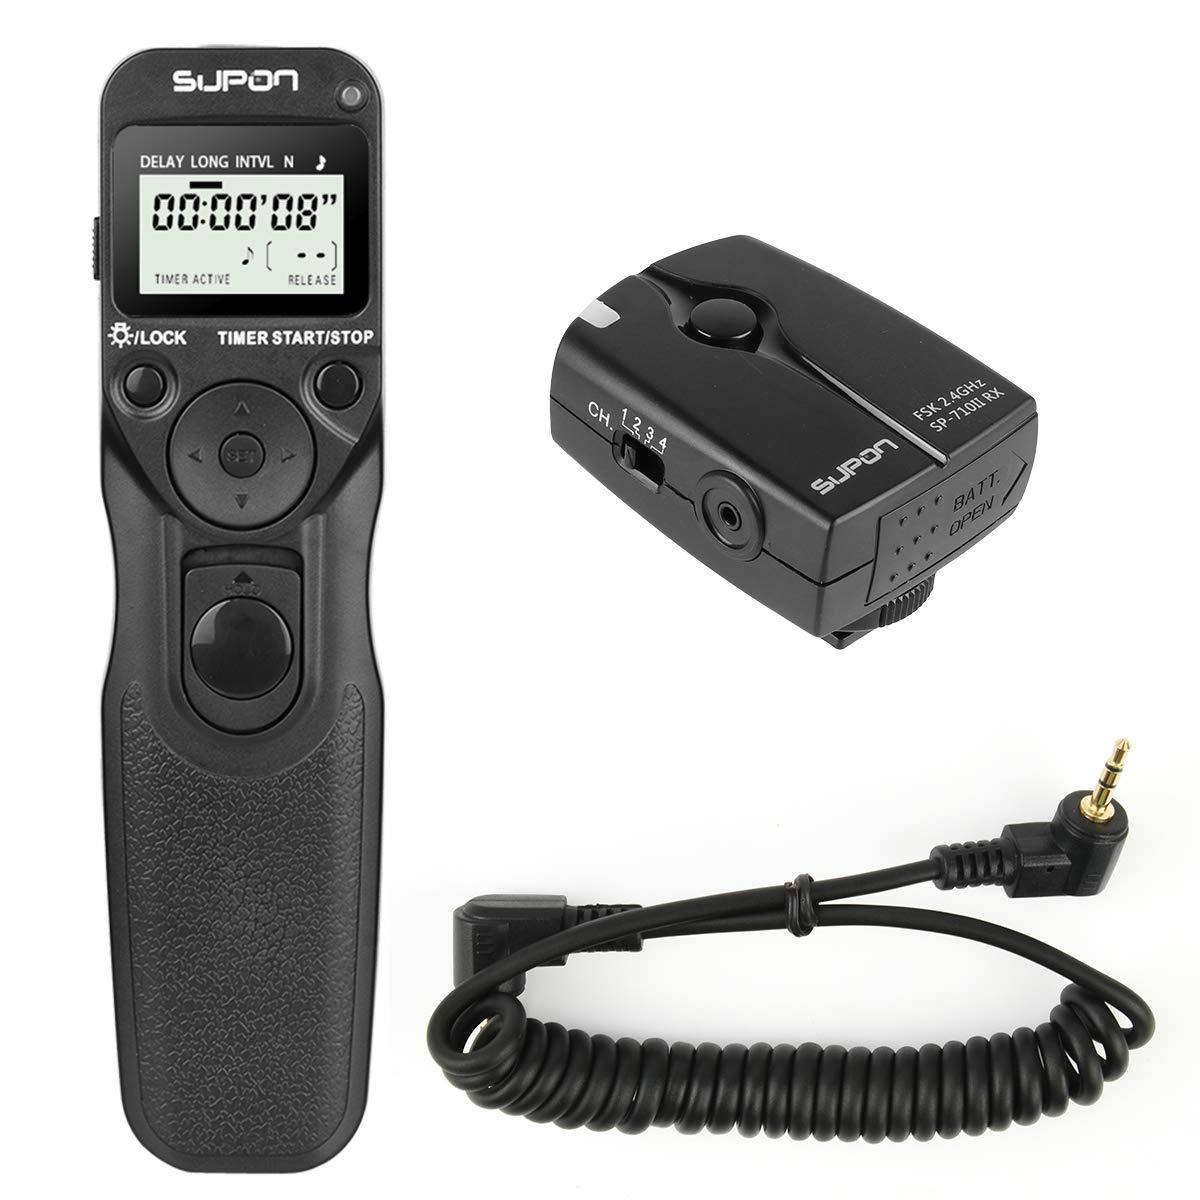 Cable disparador Nikon d300s d2xs d2h d3s d2hs d700 d1x a distancia control remoto desencadenador